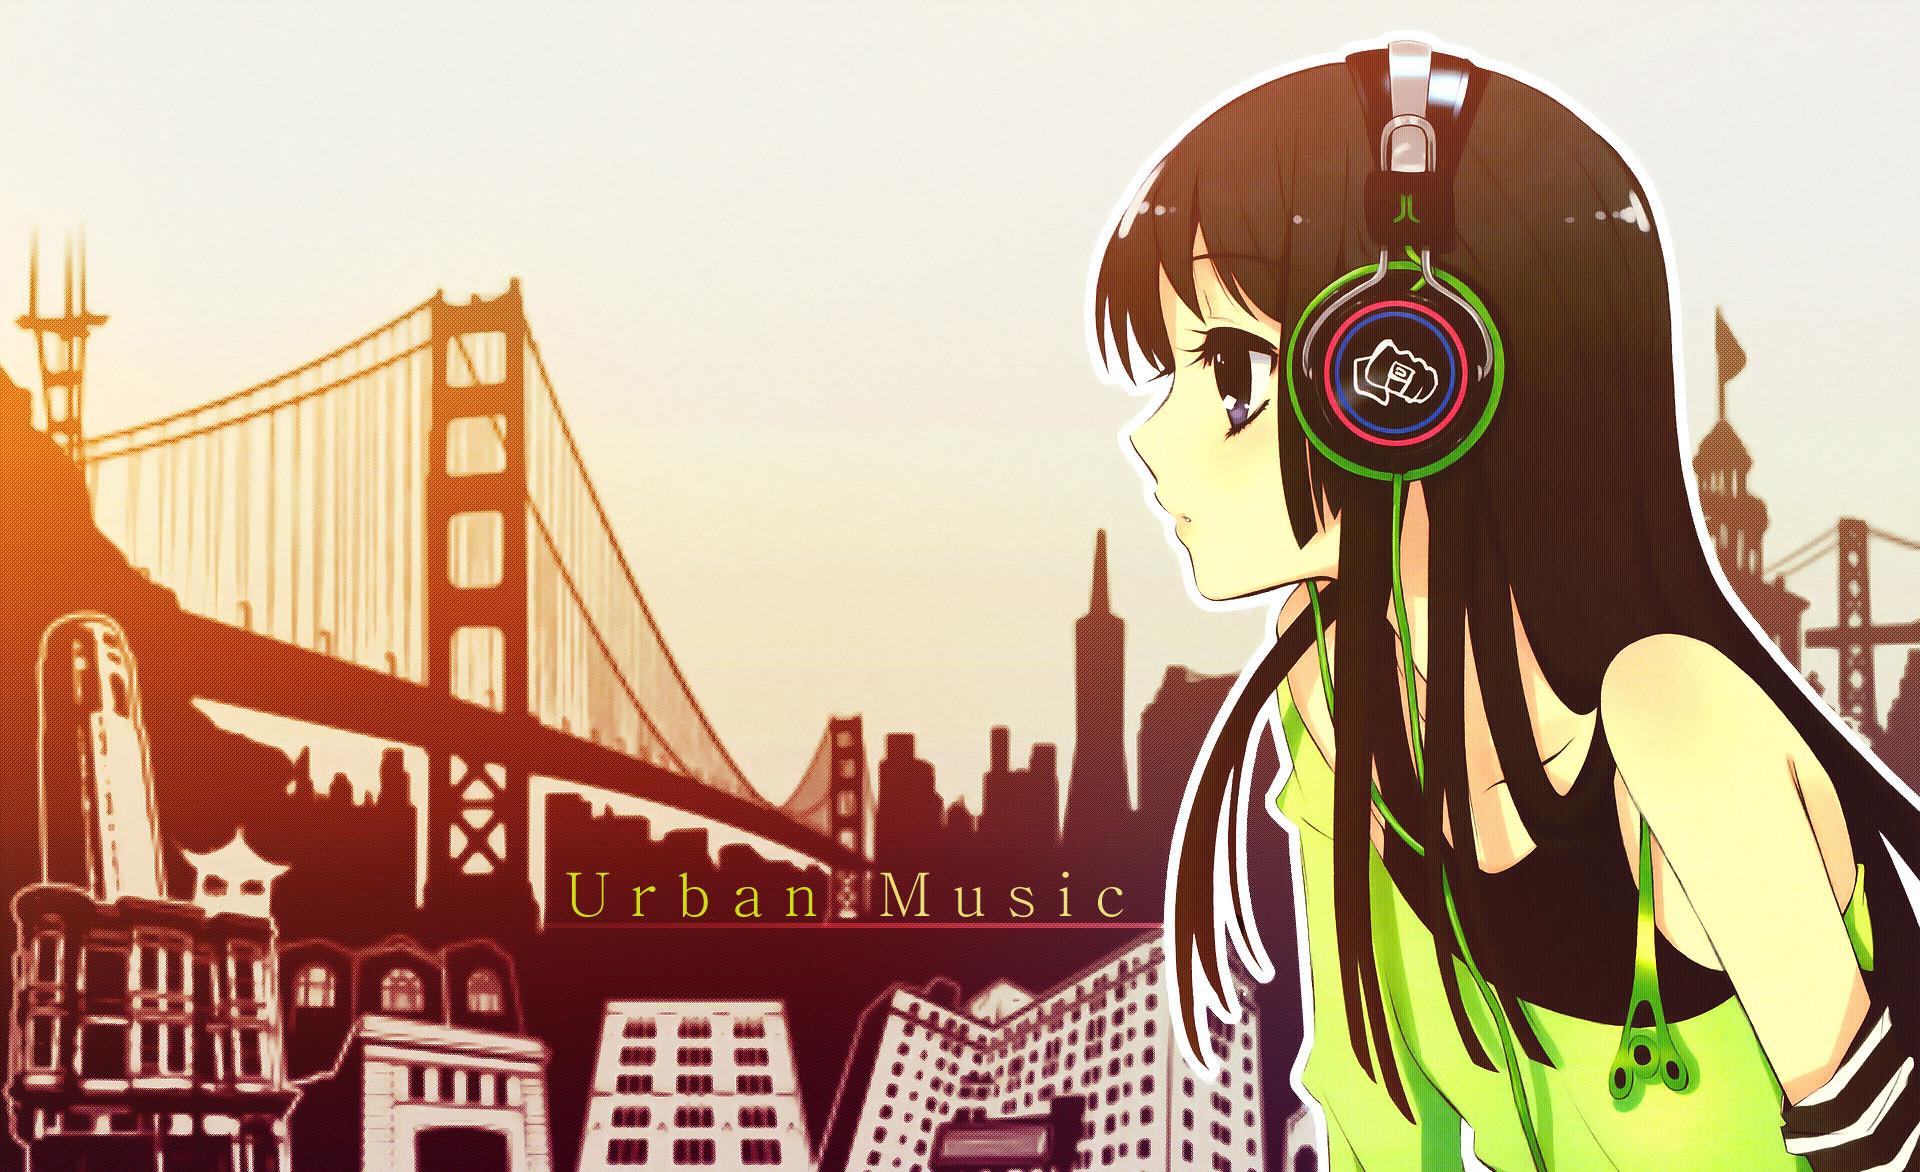 Anime Music Wallpaper Hd Background Wallpaper 33 HD Wallpapers